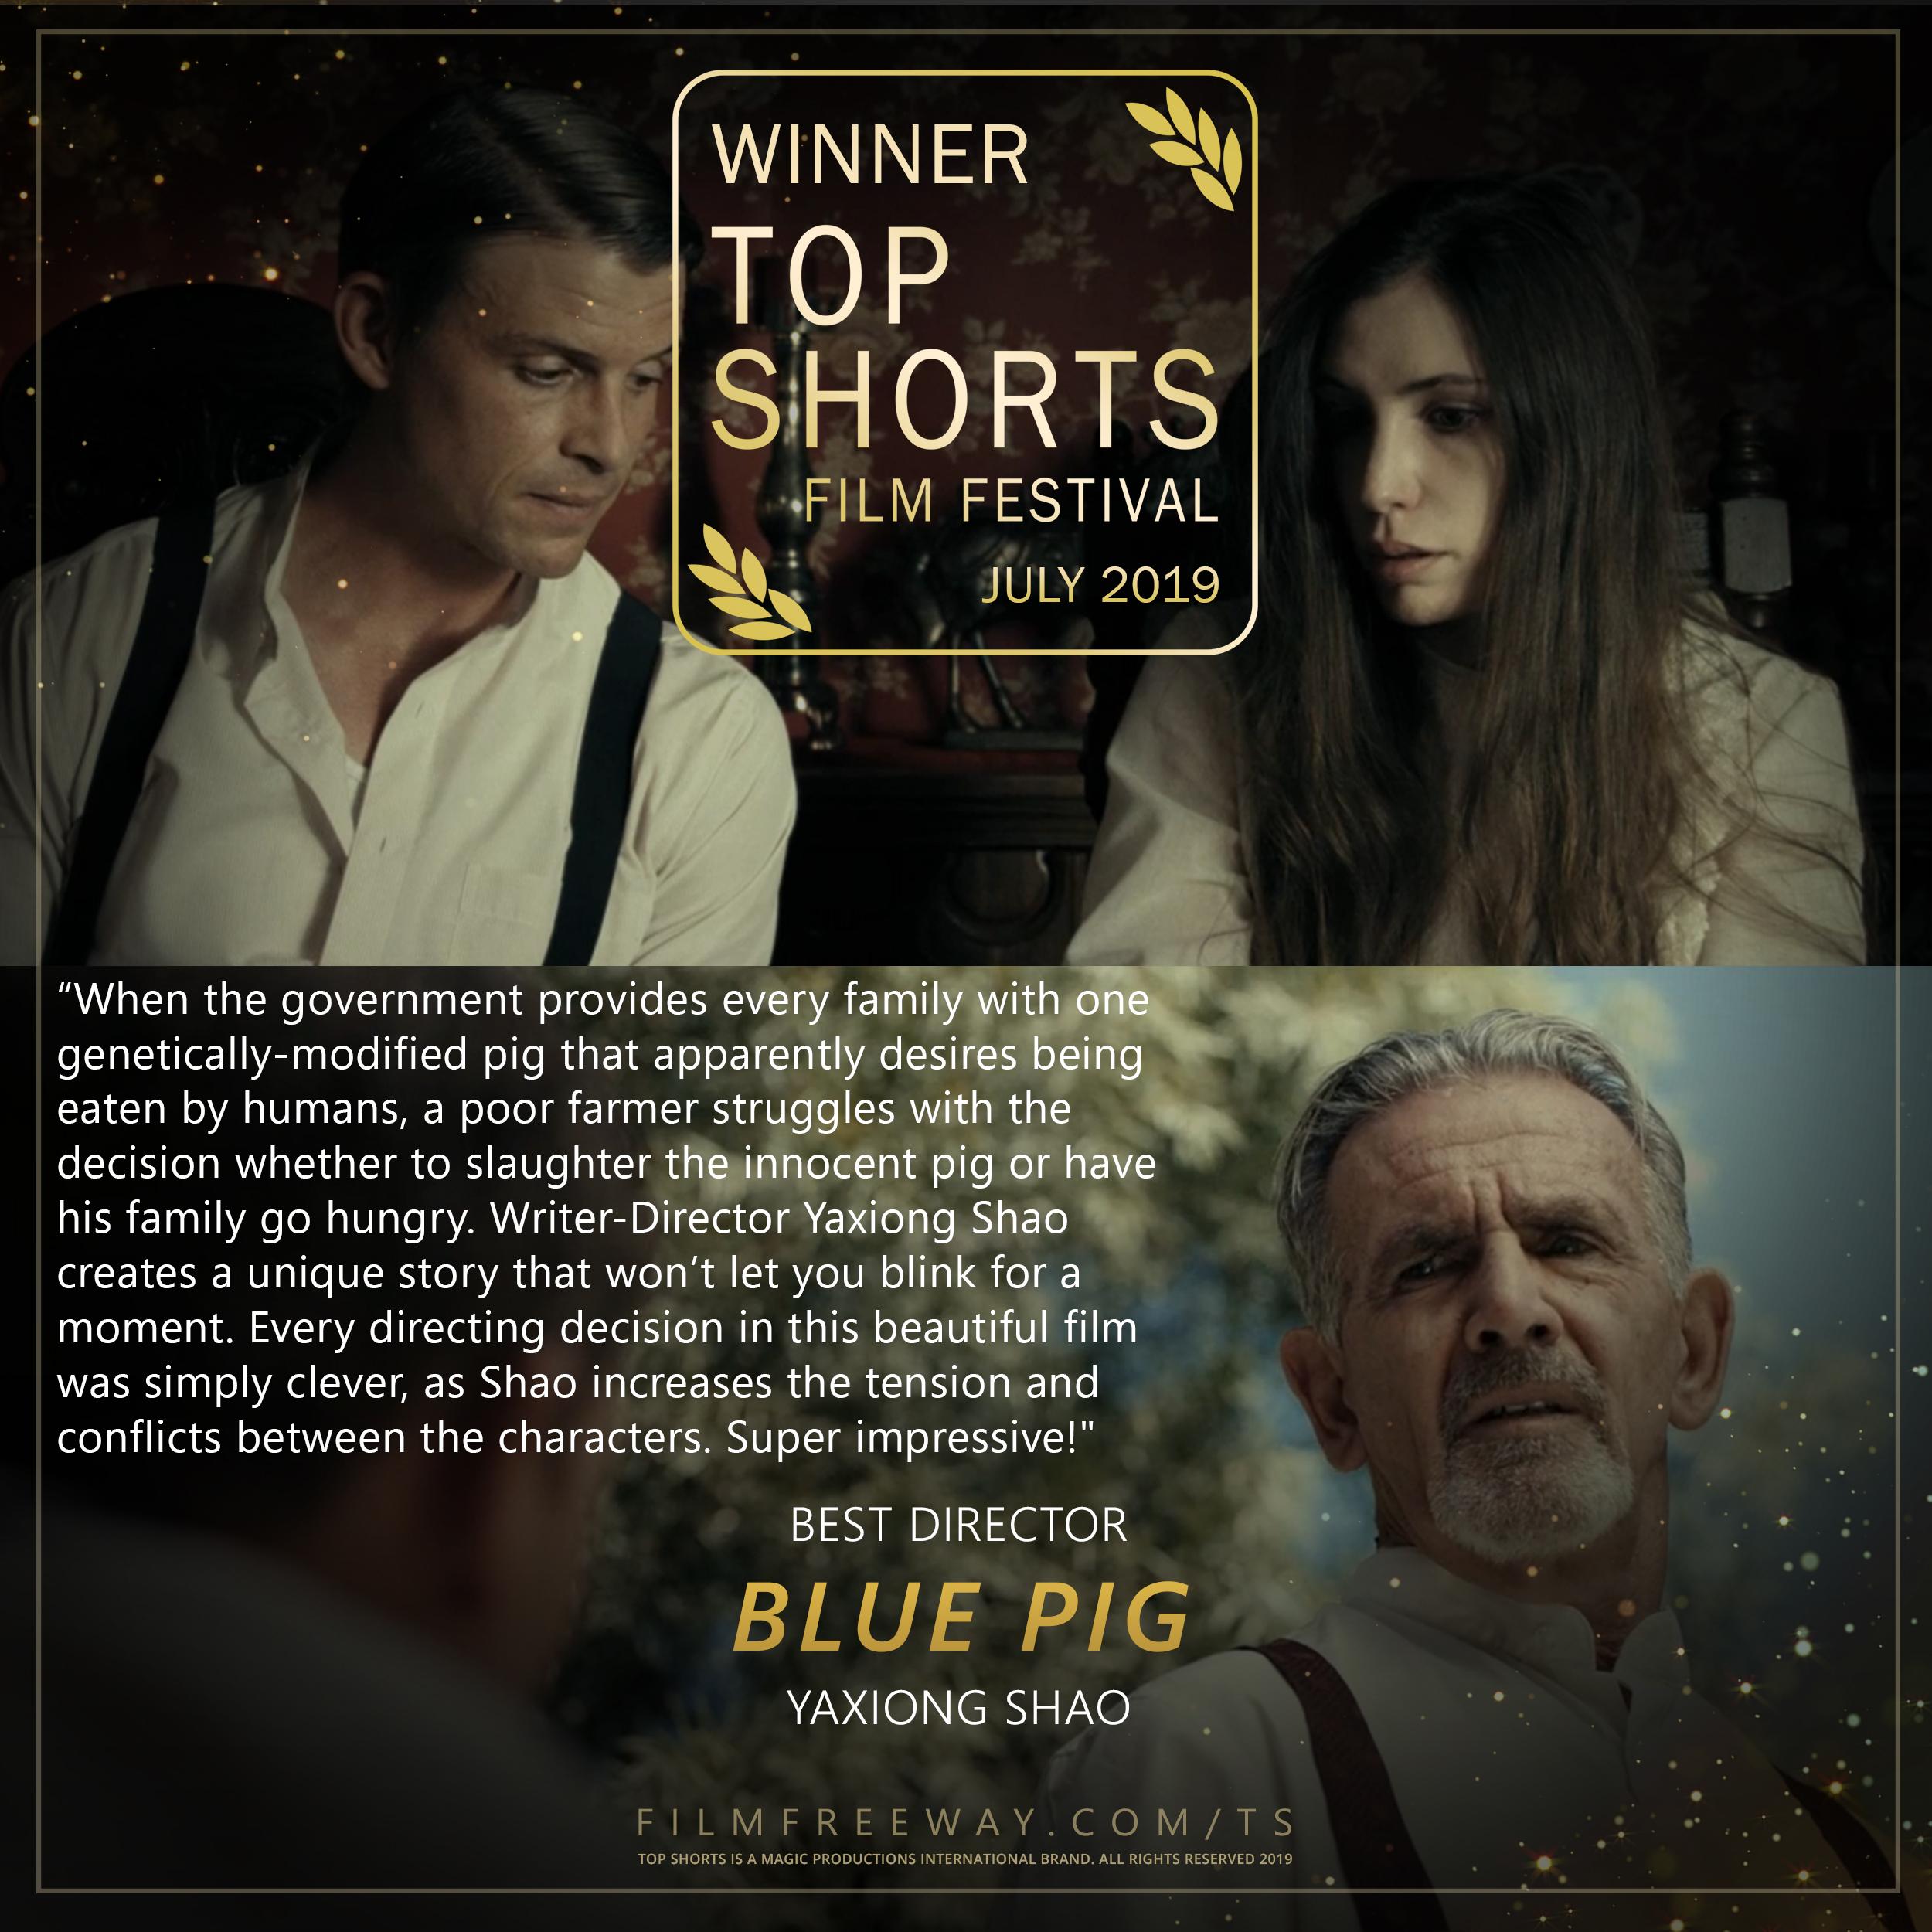 BLUE PIG design